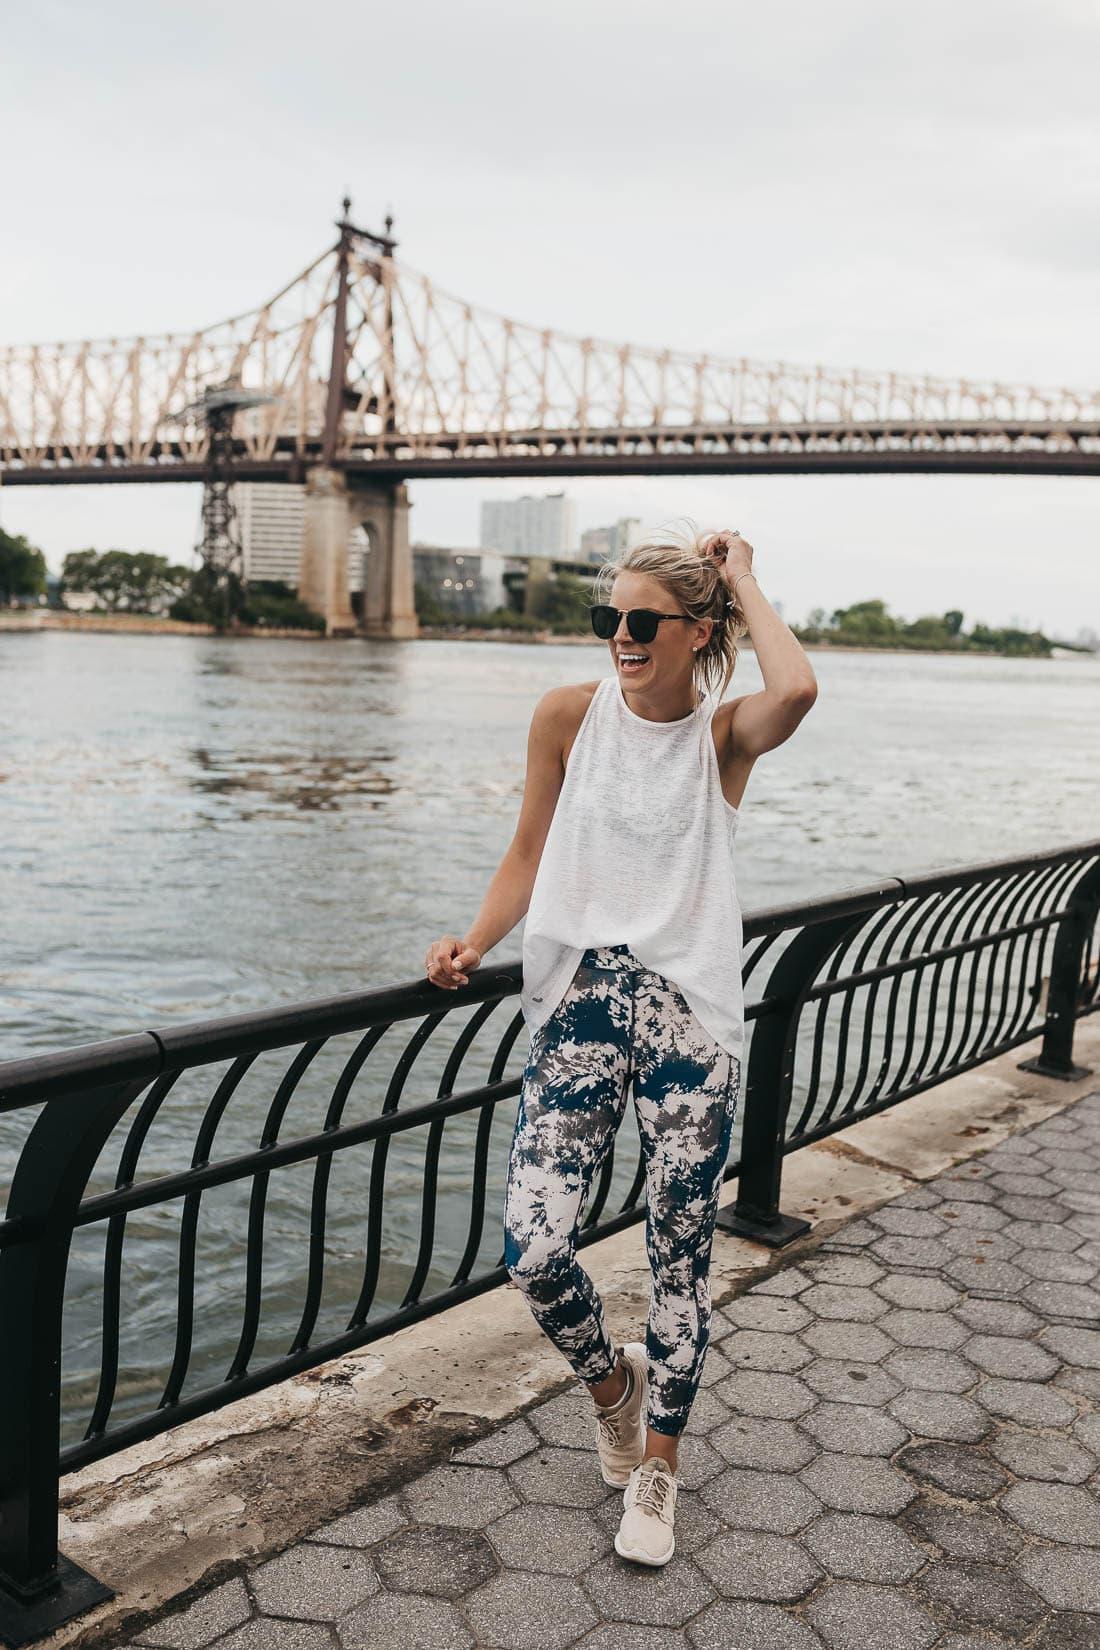 styled snapshots exercise routine